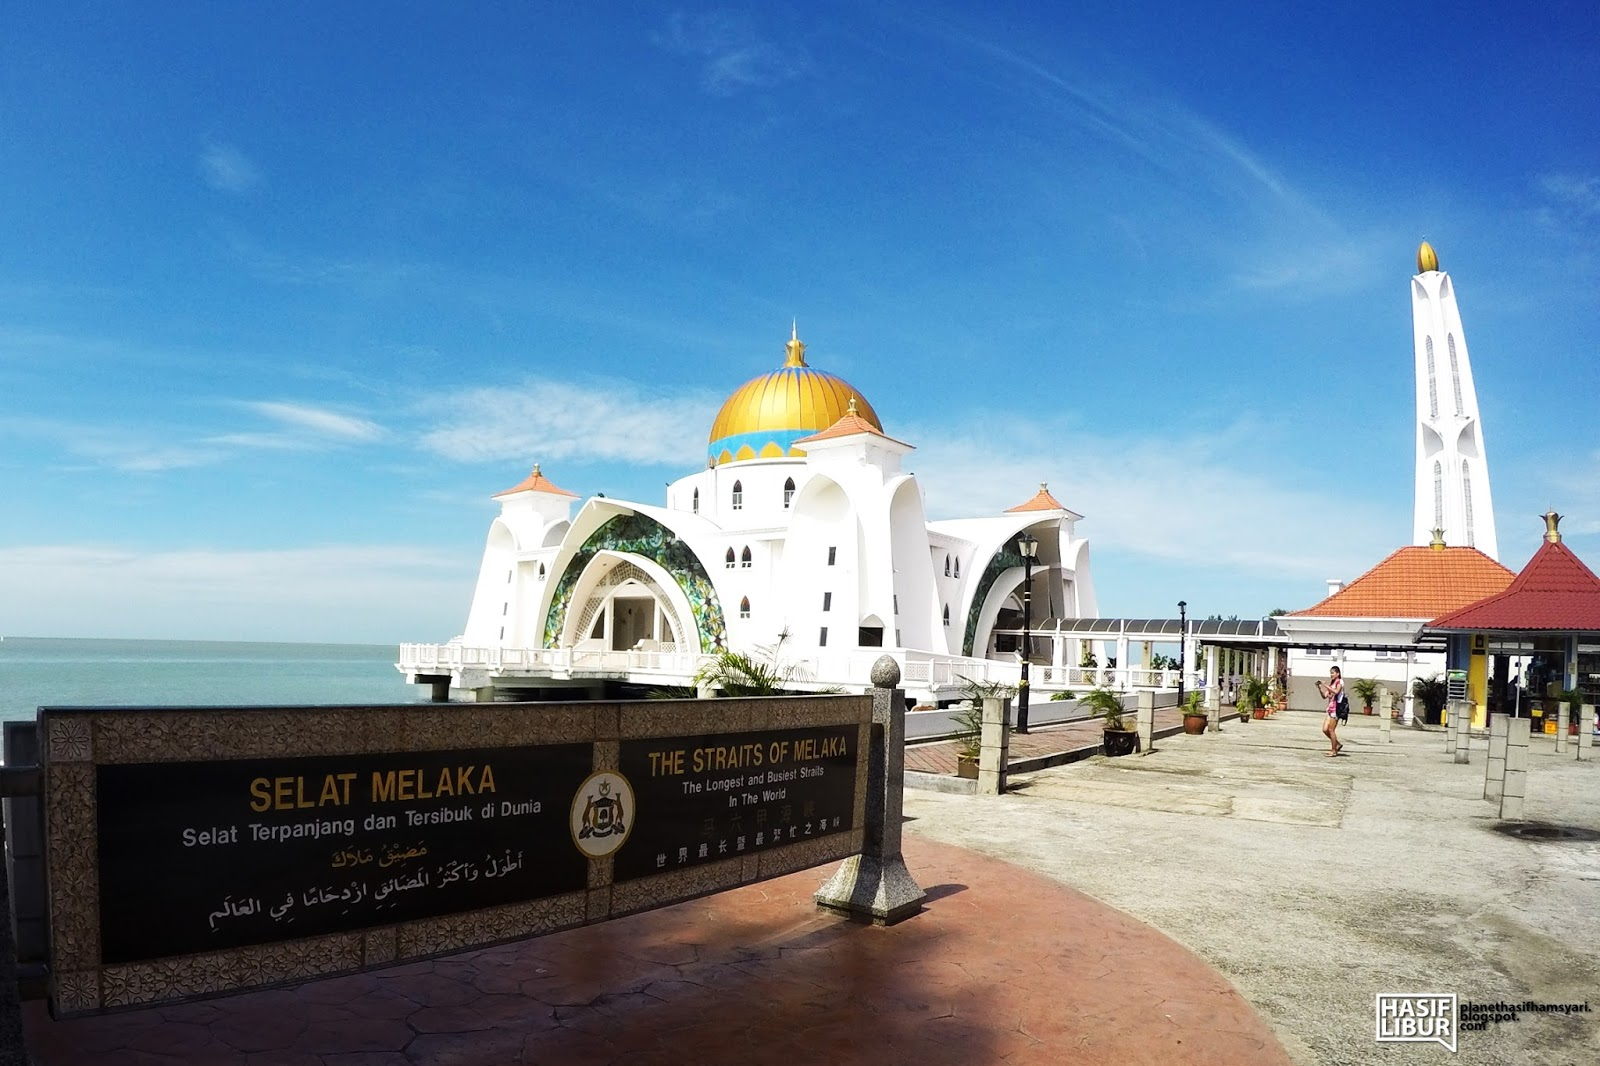 Cegah Virus Corona, Masjid di Malaysia akan Diimbau untuk Tutup 10 Hari